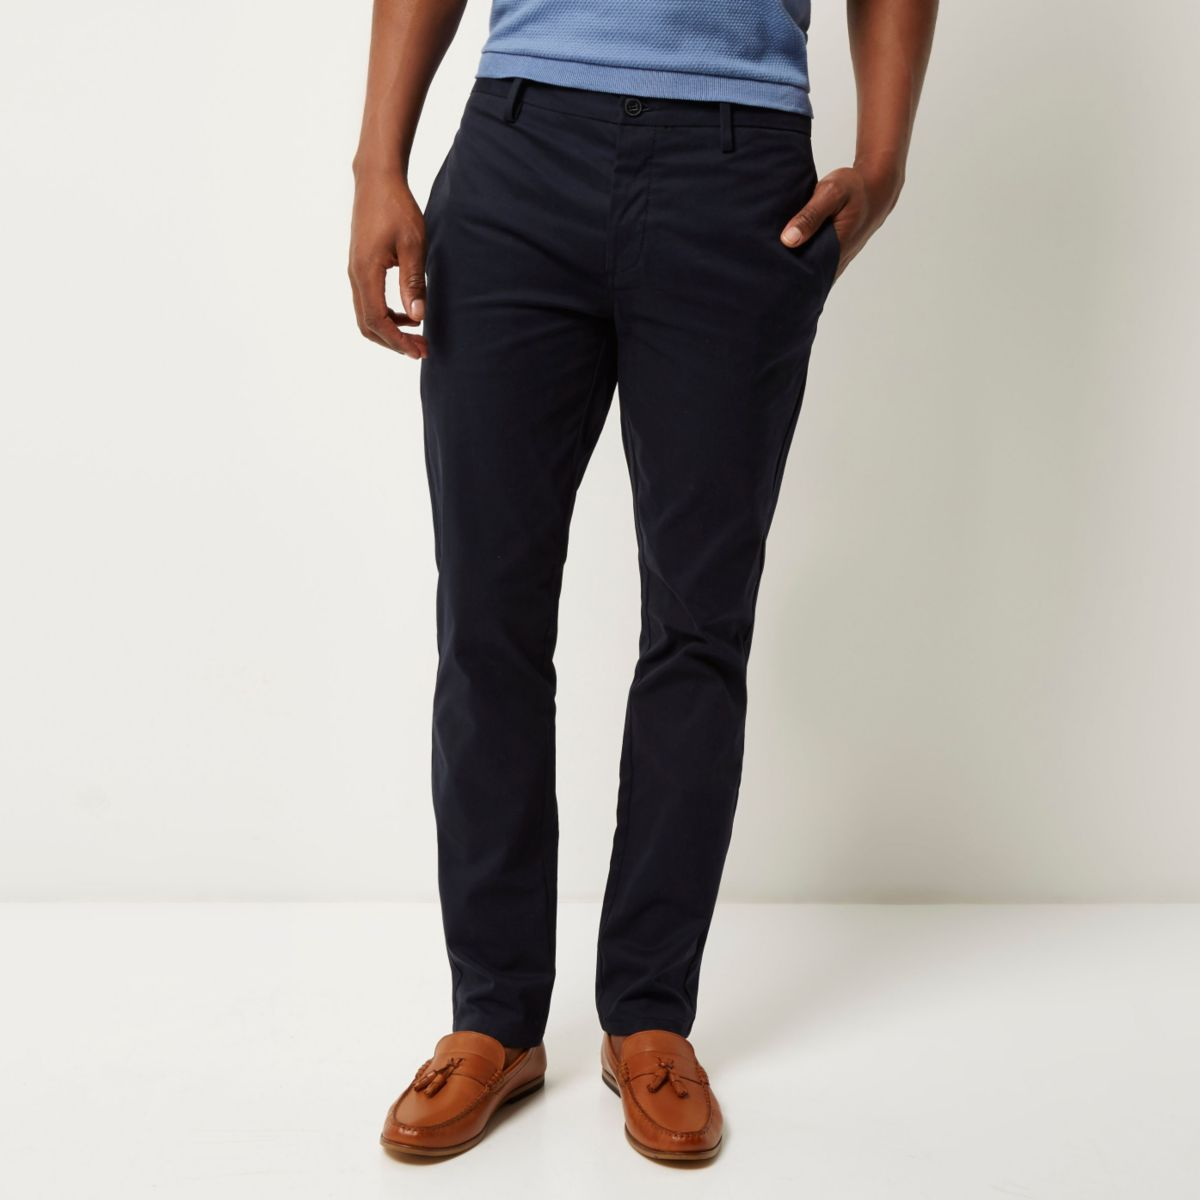 pantalon chino bleu marine stretch slim bureau soldes homme. Black Bedroom Furniture Sets. Home Design Ideas